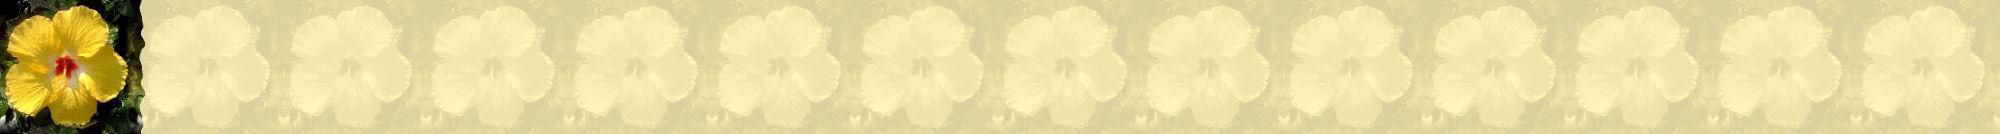 Fondo IM flores_050.imf